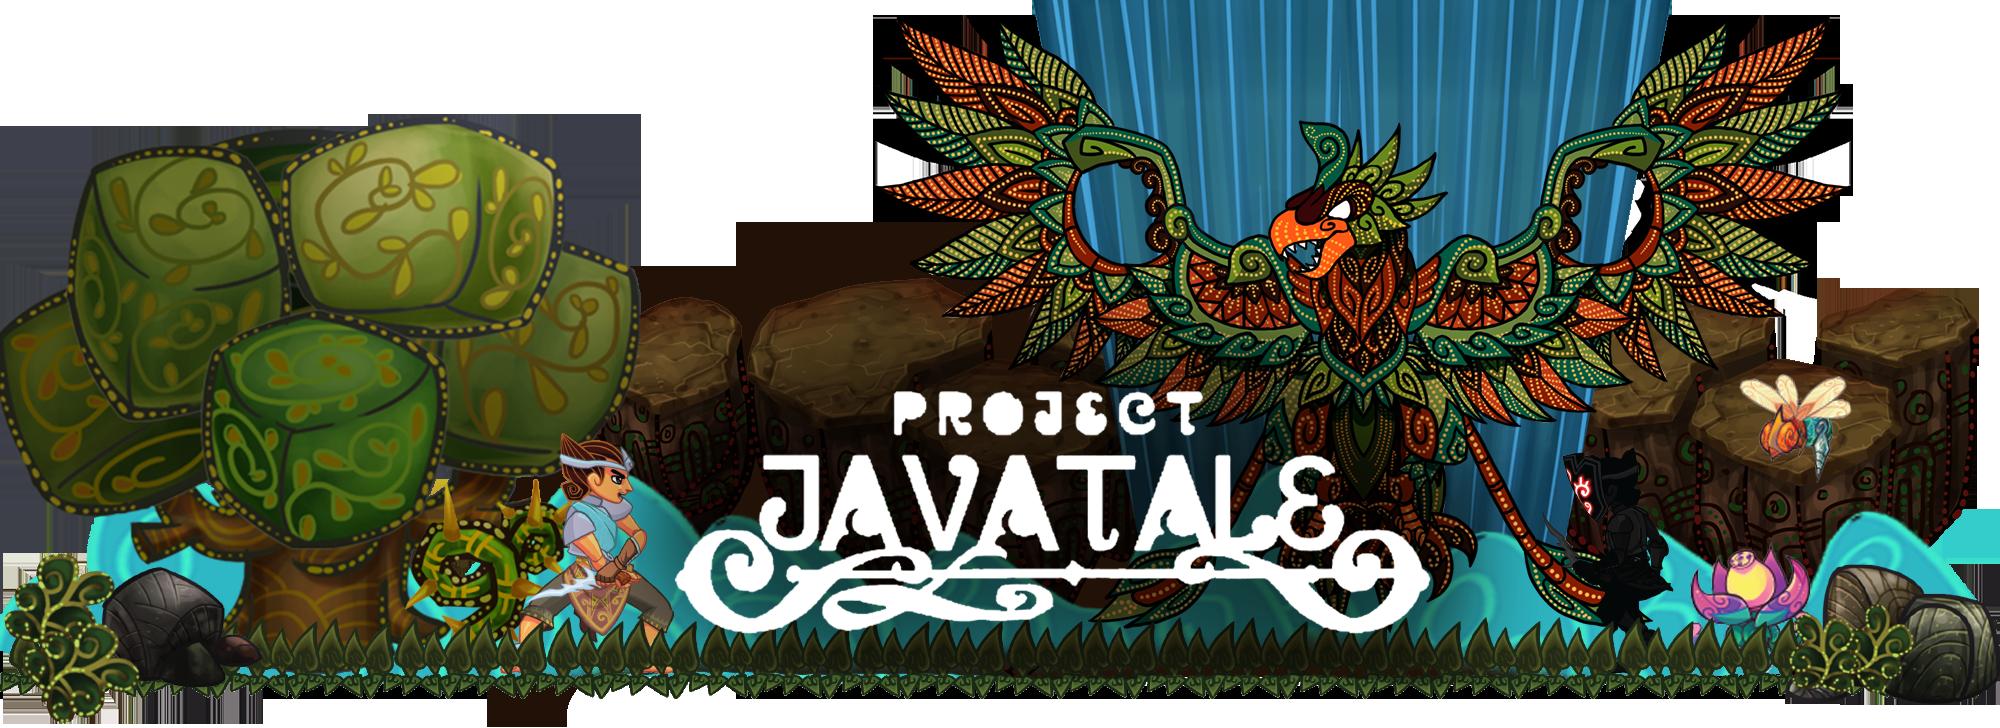 Project Javatale